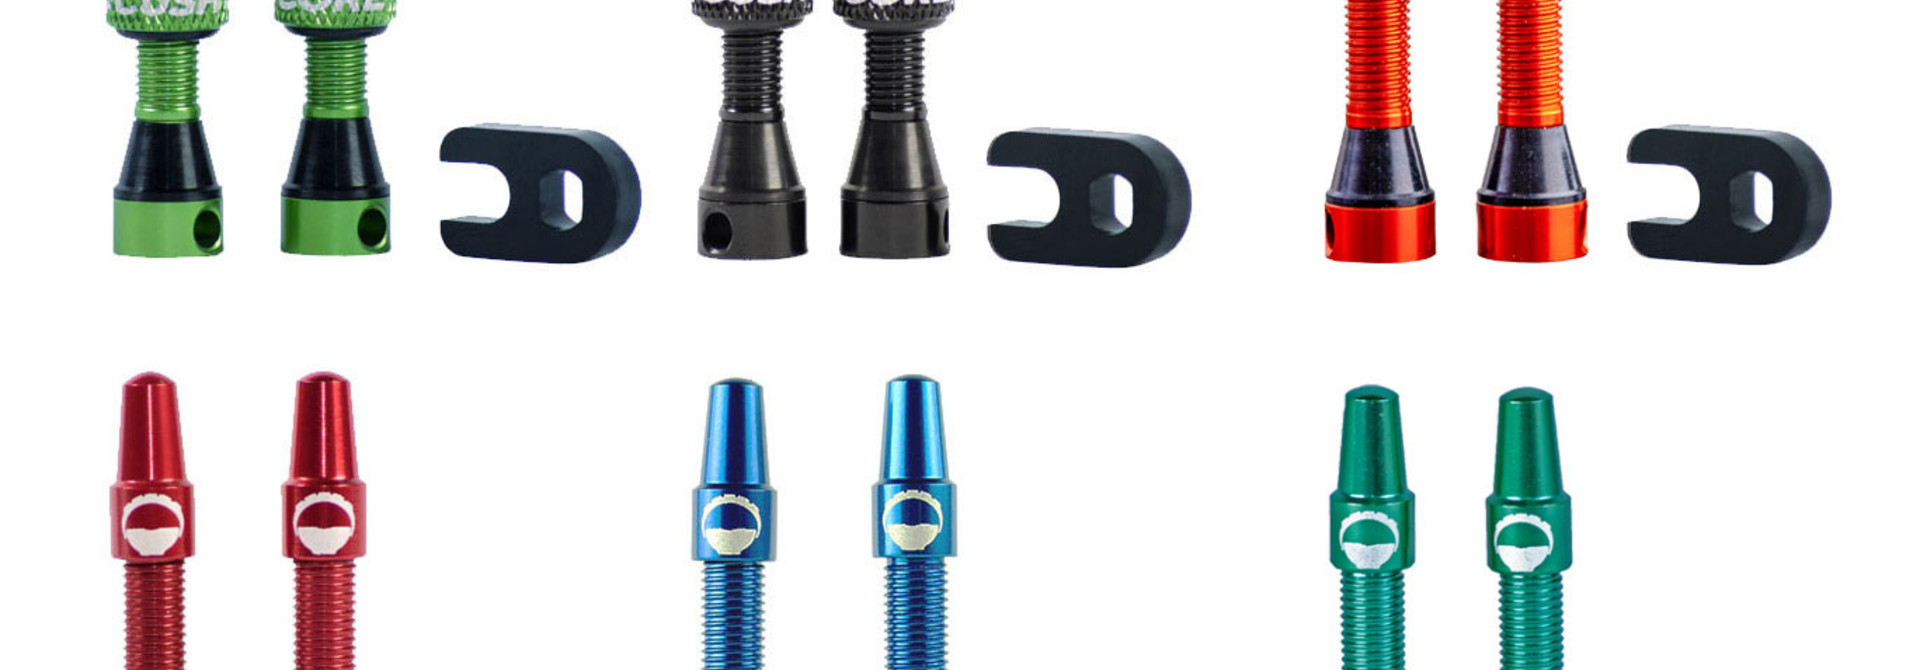 CushCore Compatible 44mm Presta Tubeless Tire Valve Set